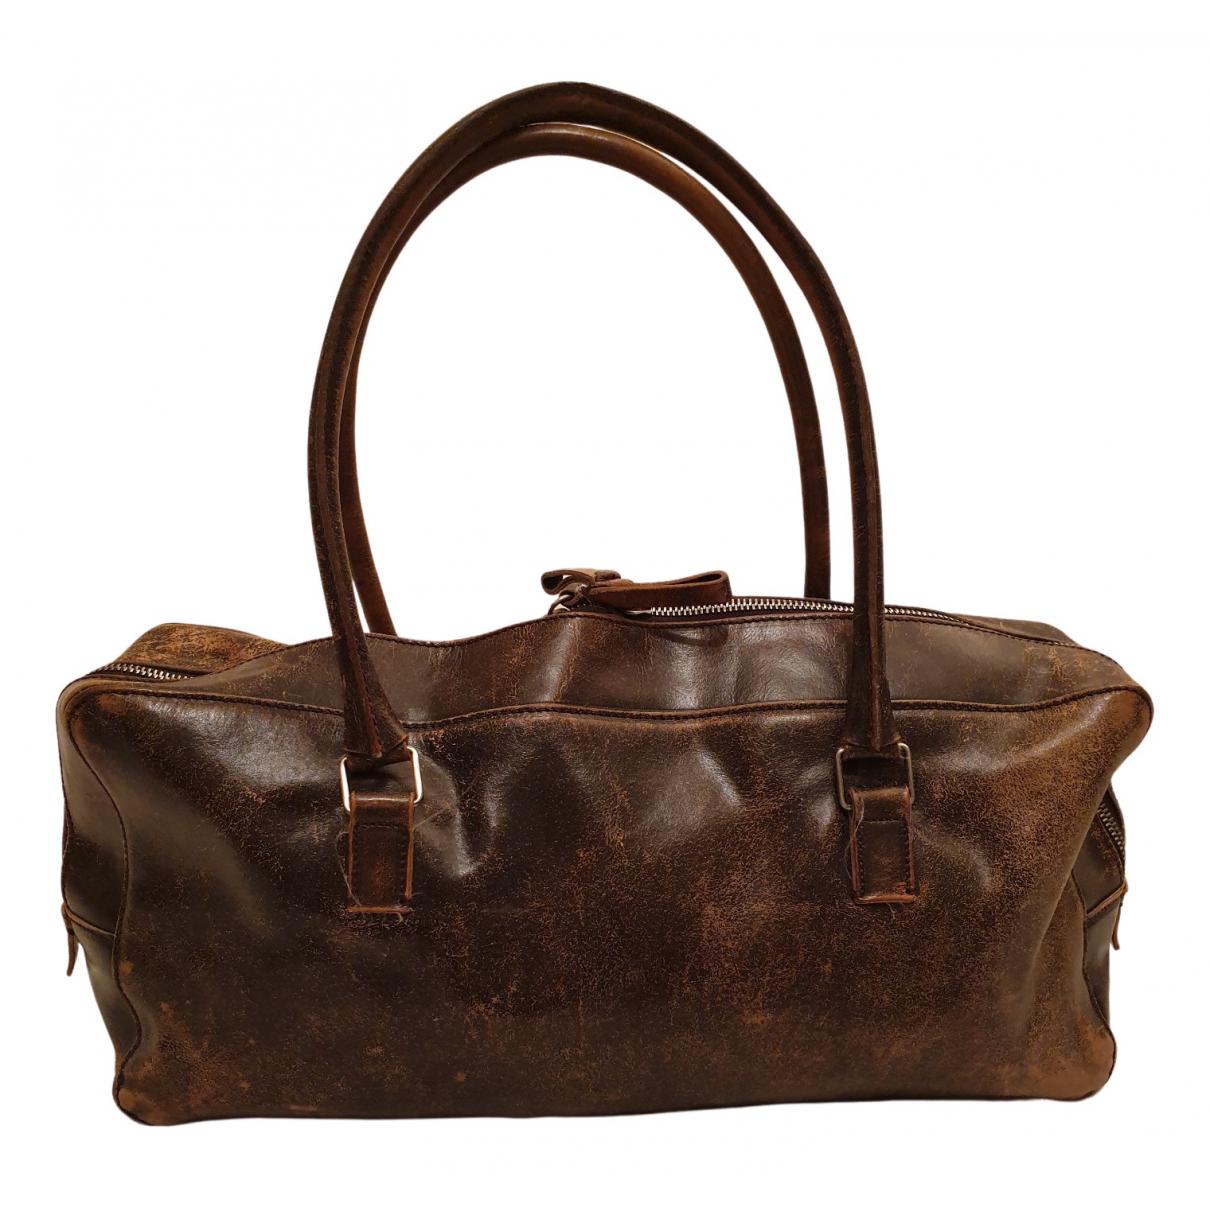 Miu Miu N Brown Leather handbag for Women N